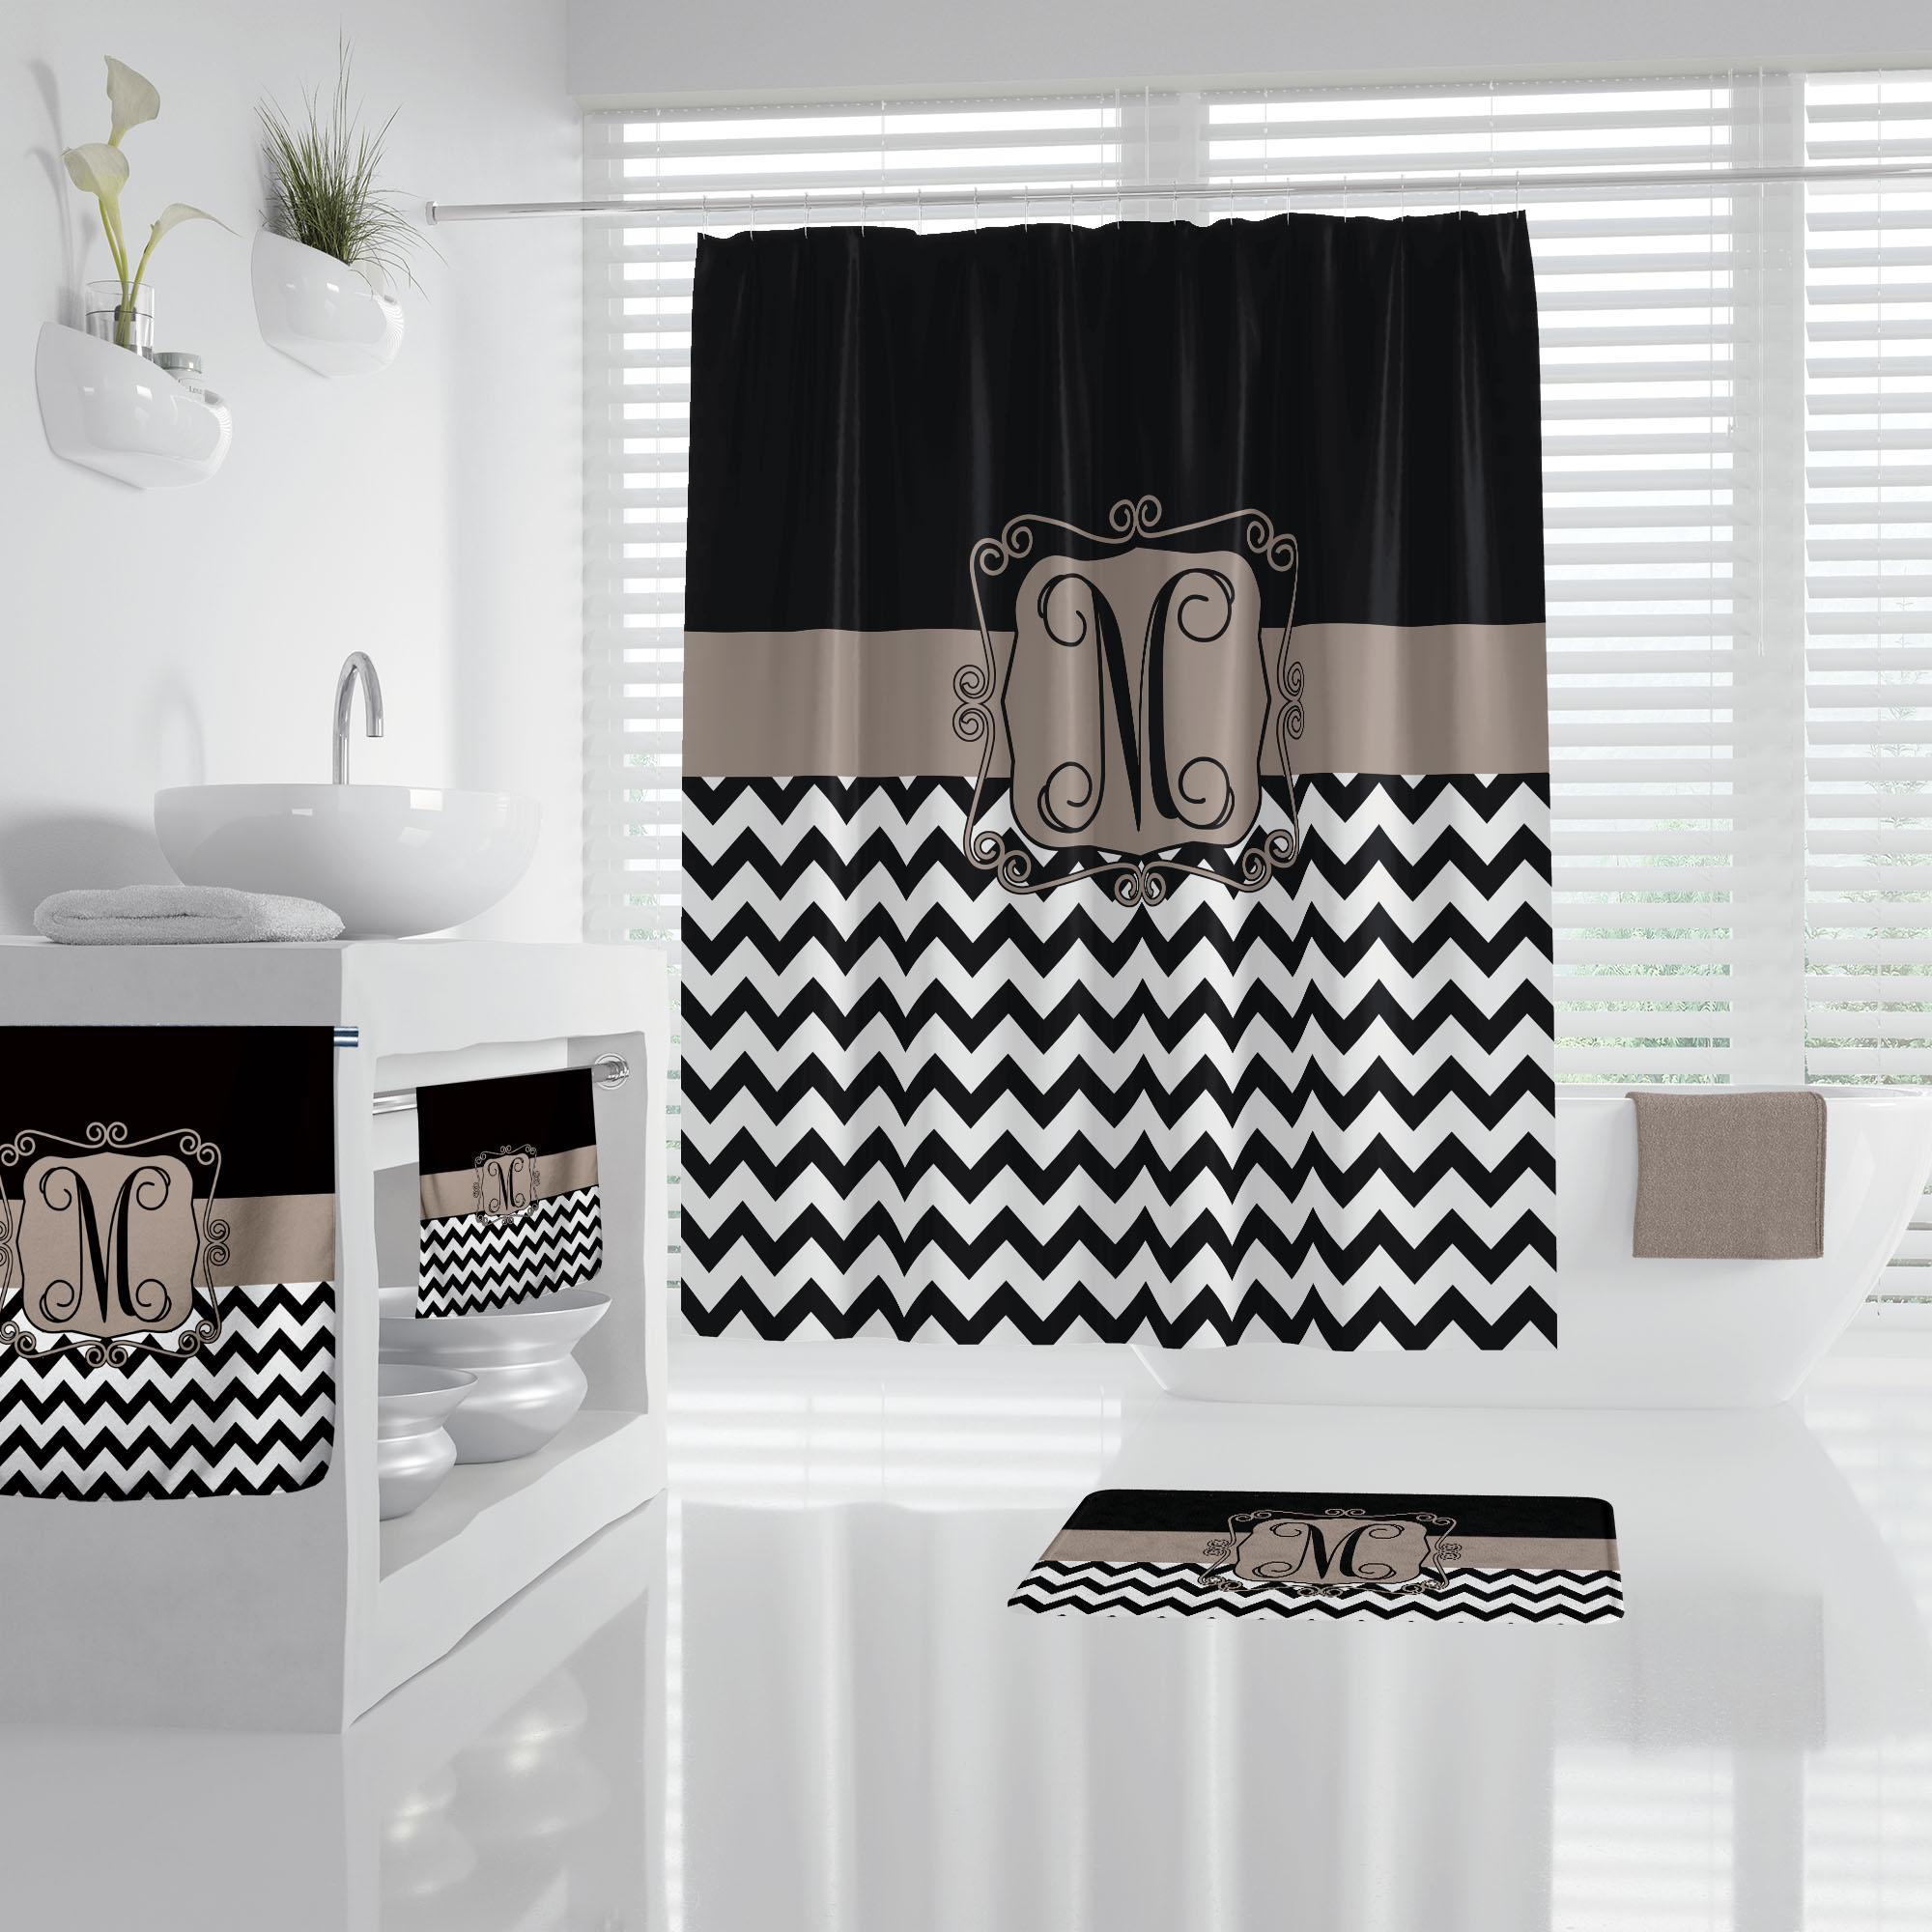 Taupe Bathroom Accessories, Chevron Bathroom Accessories